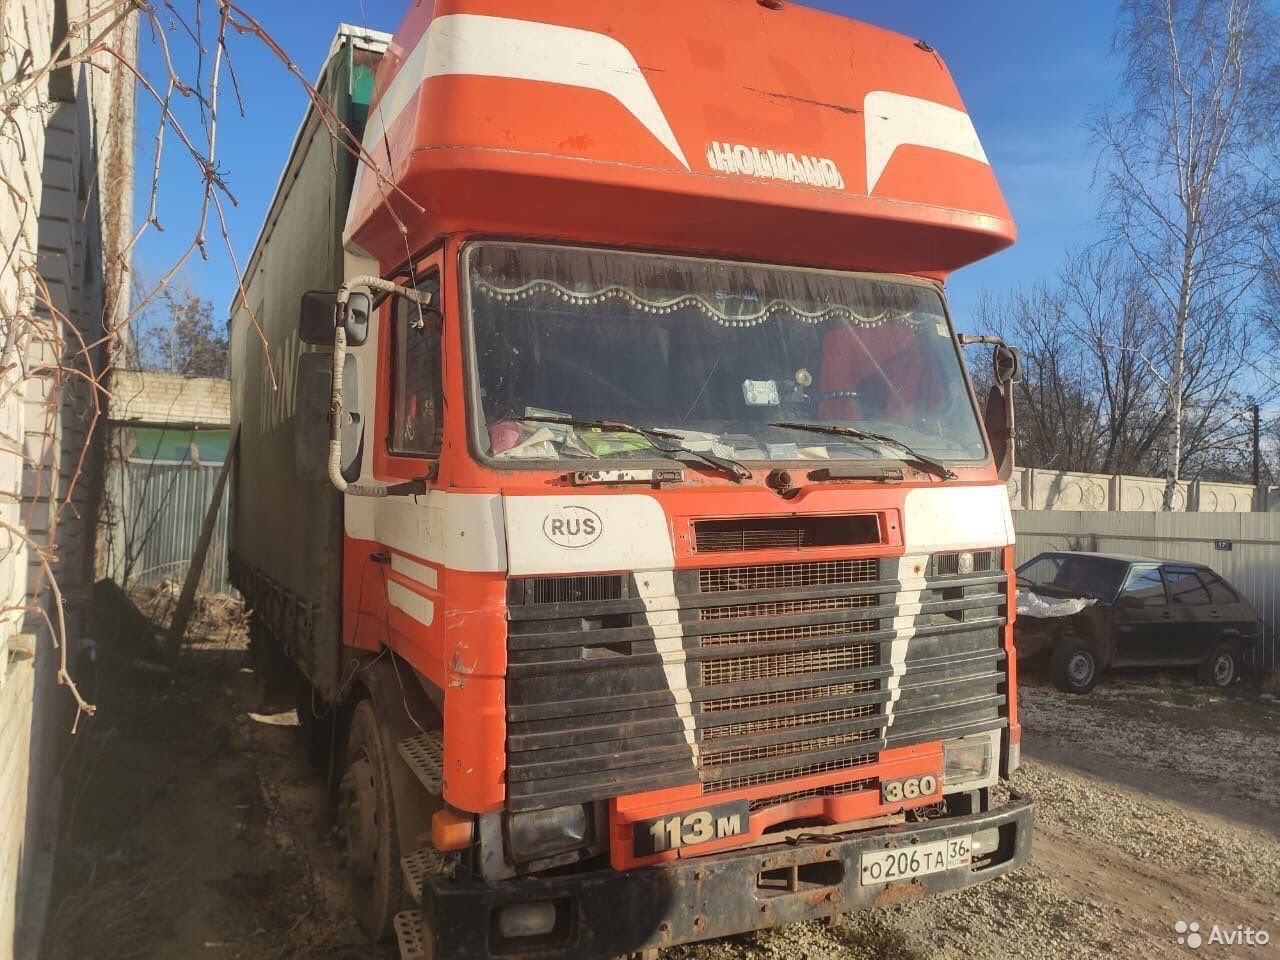 Rusland-Jan-Dijkstra--(3)